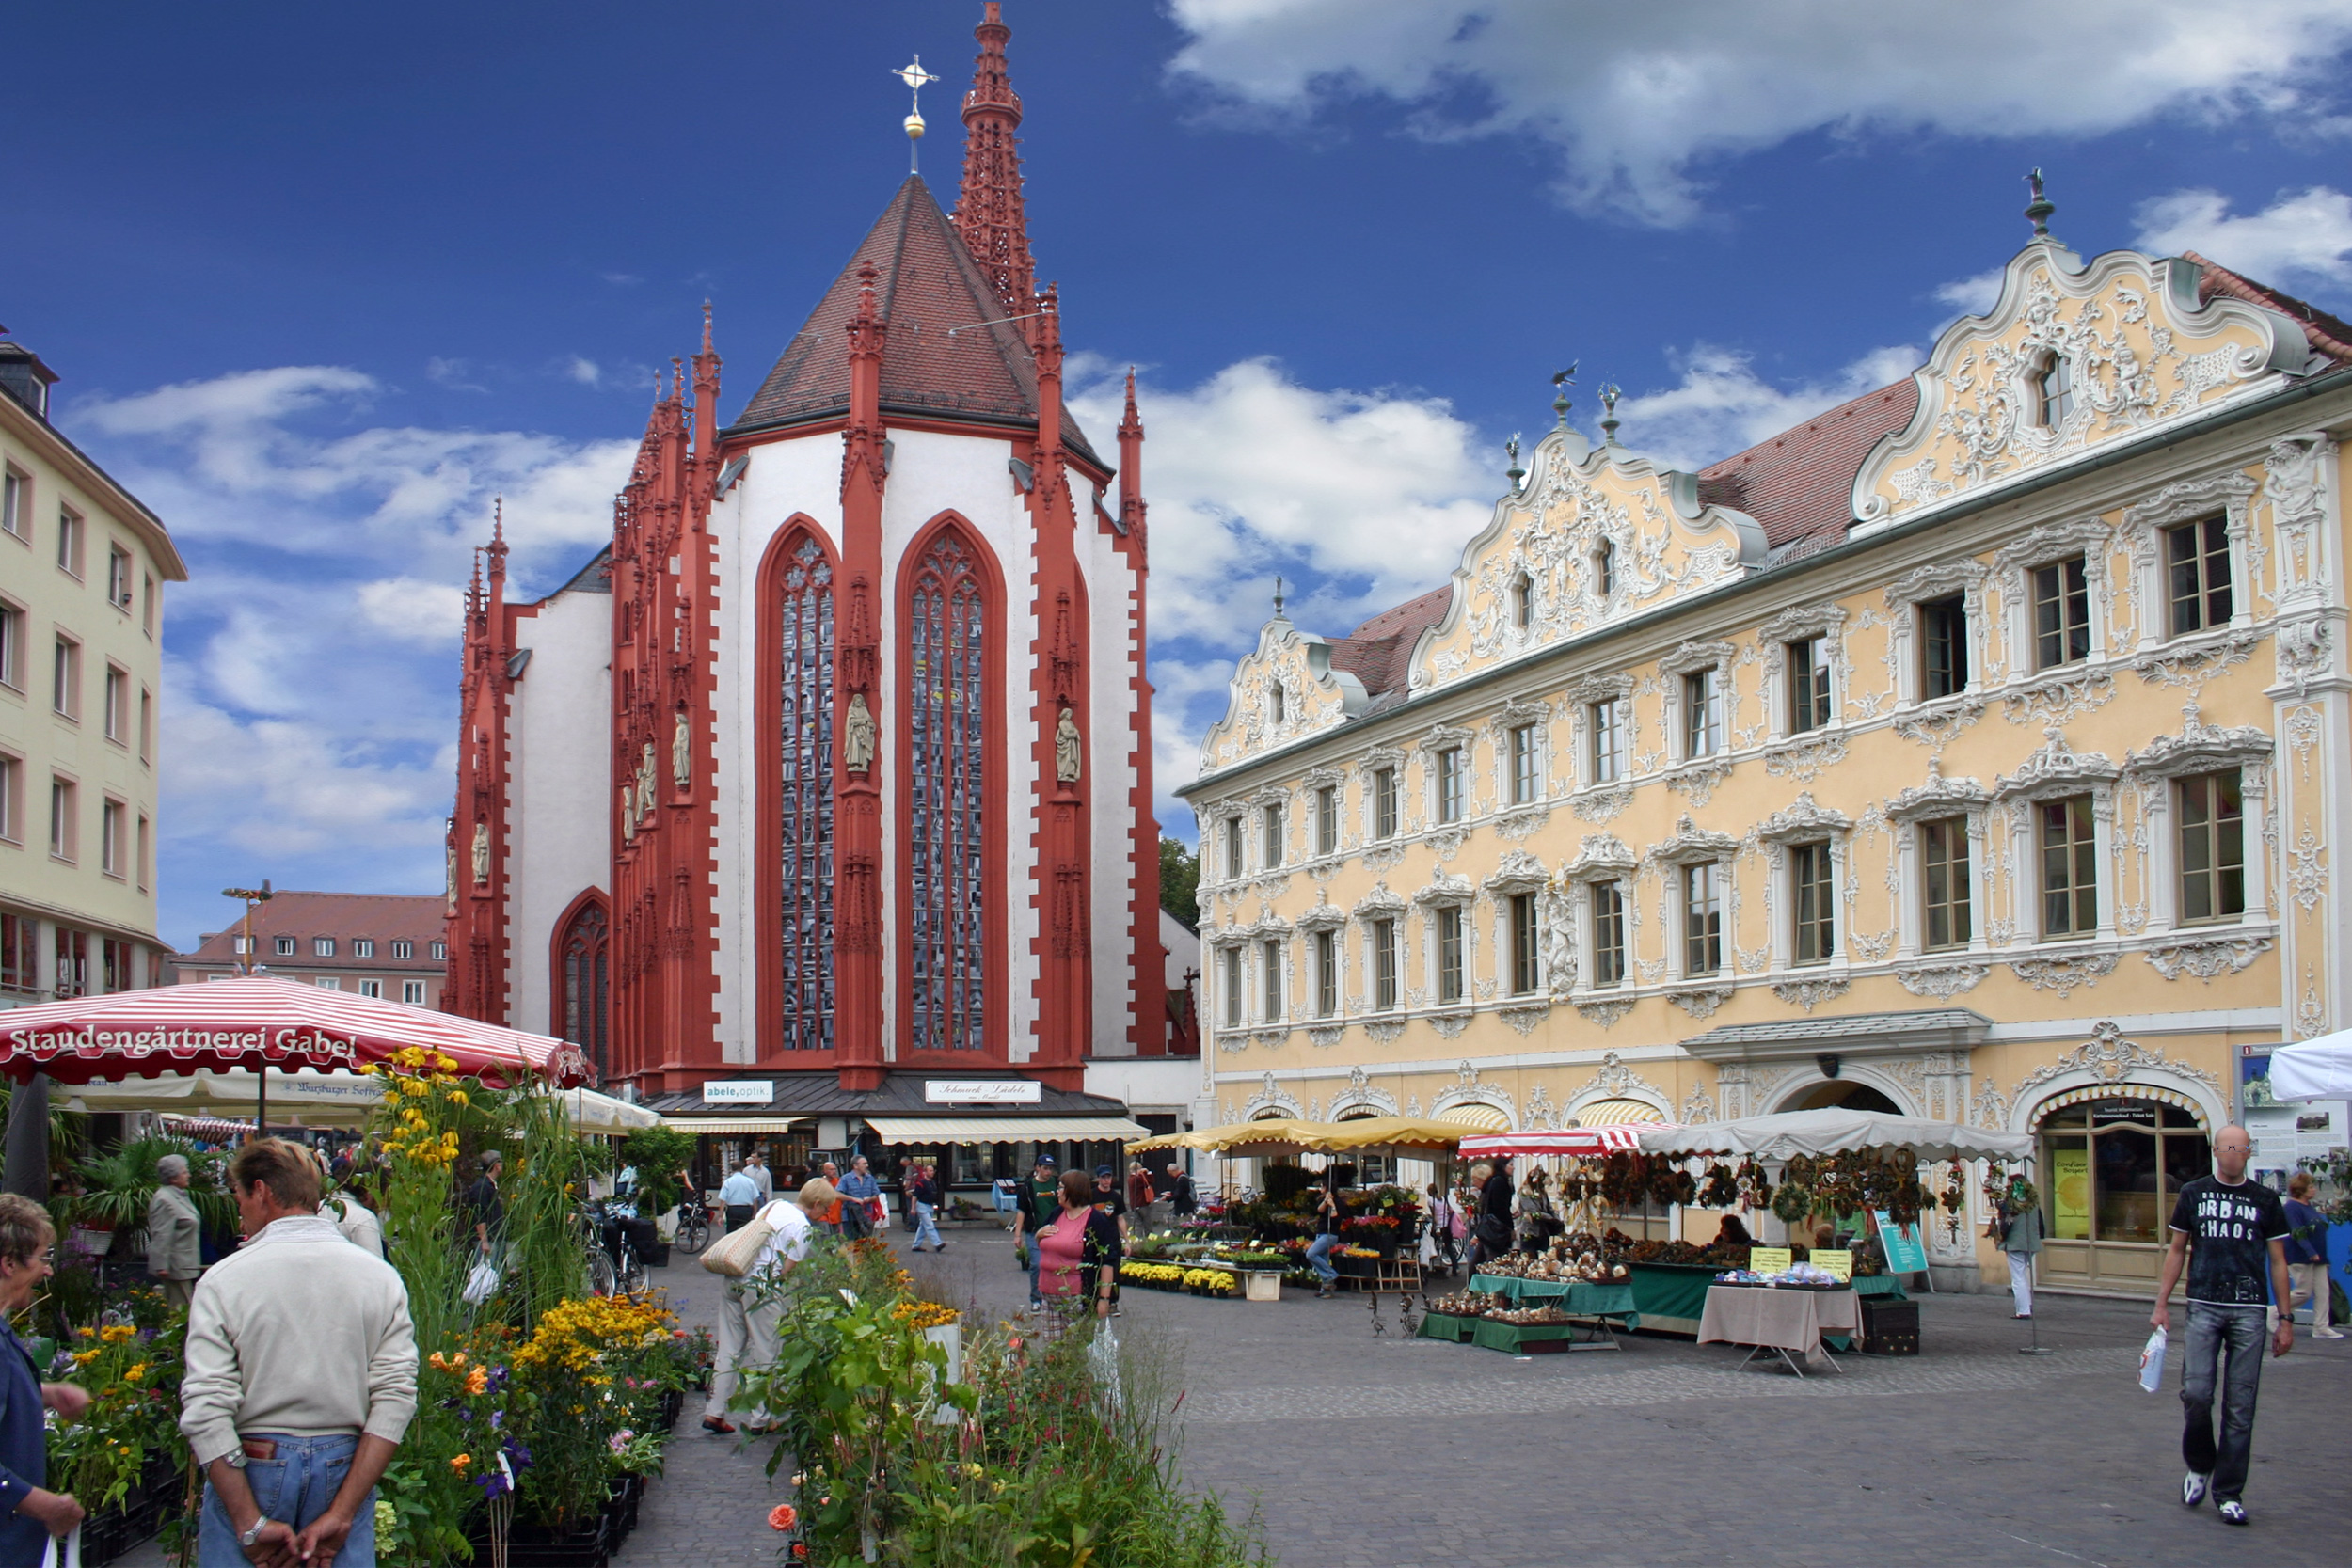 Würzburg dating